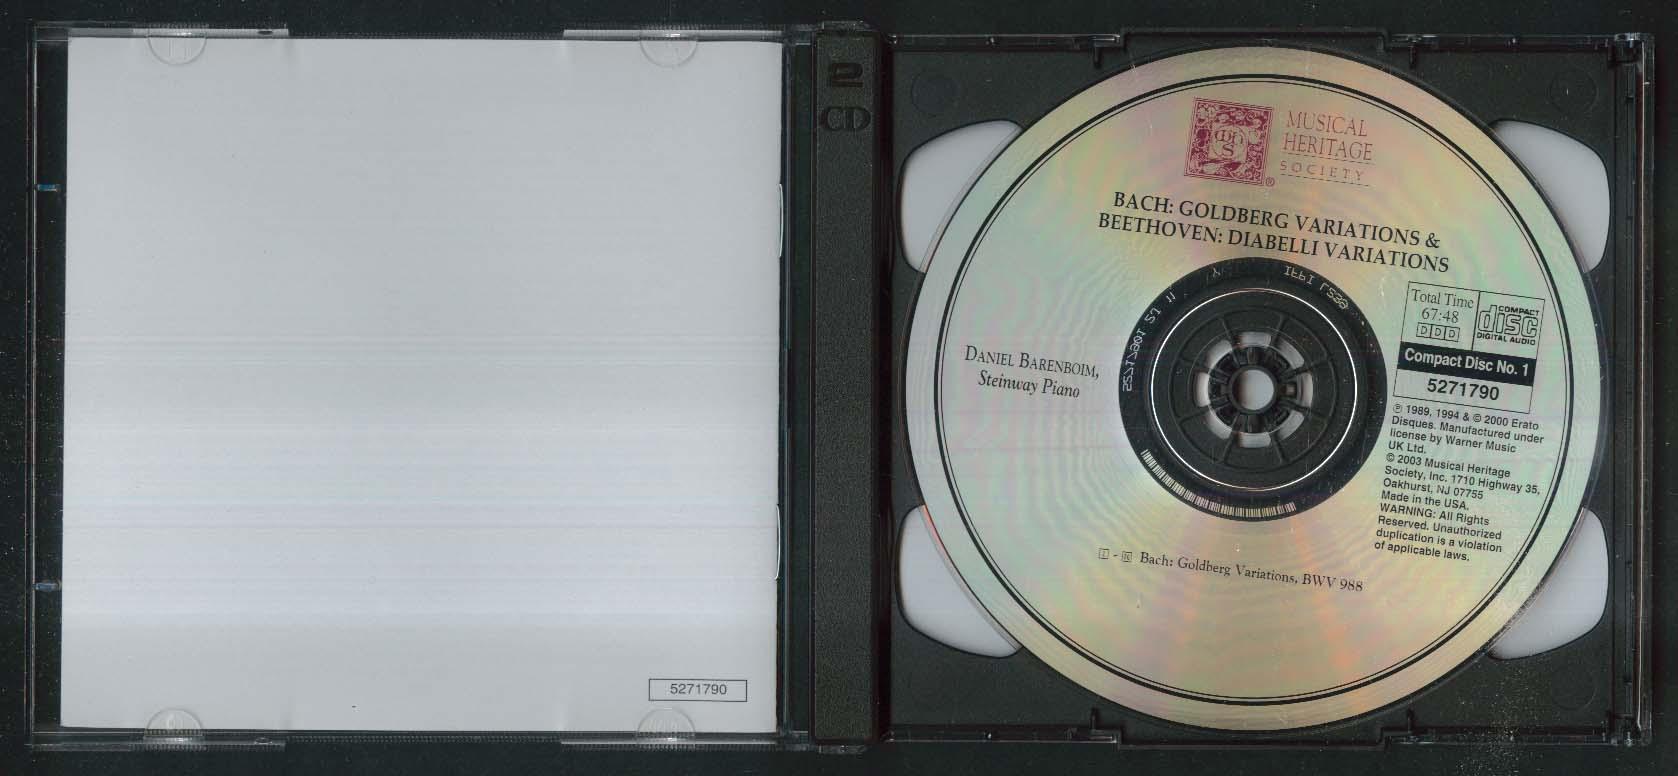 Daniel Barenboim Bach BWV 988 Beethoven Musical Heritage Society CD